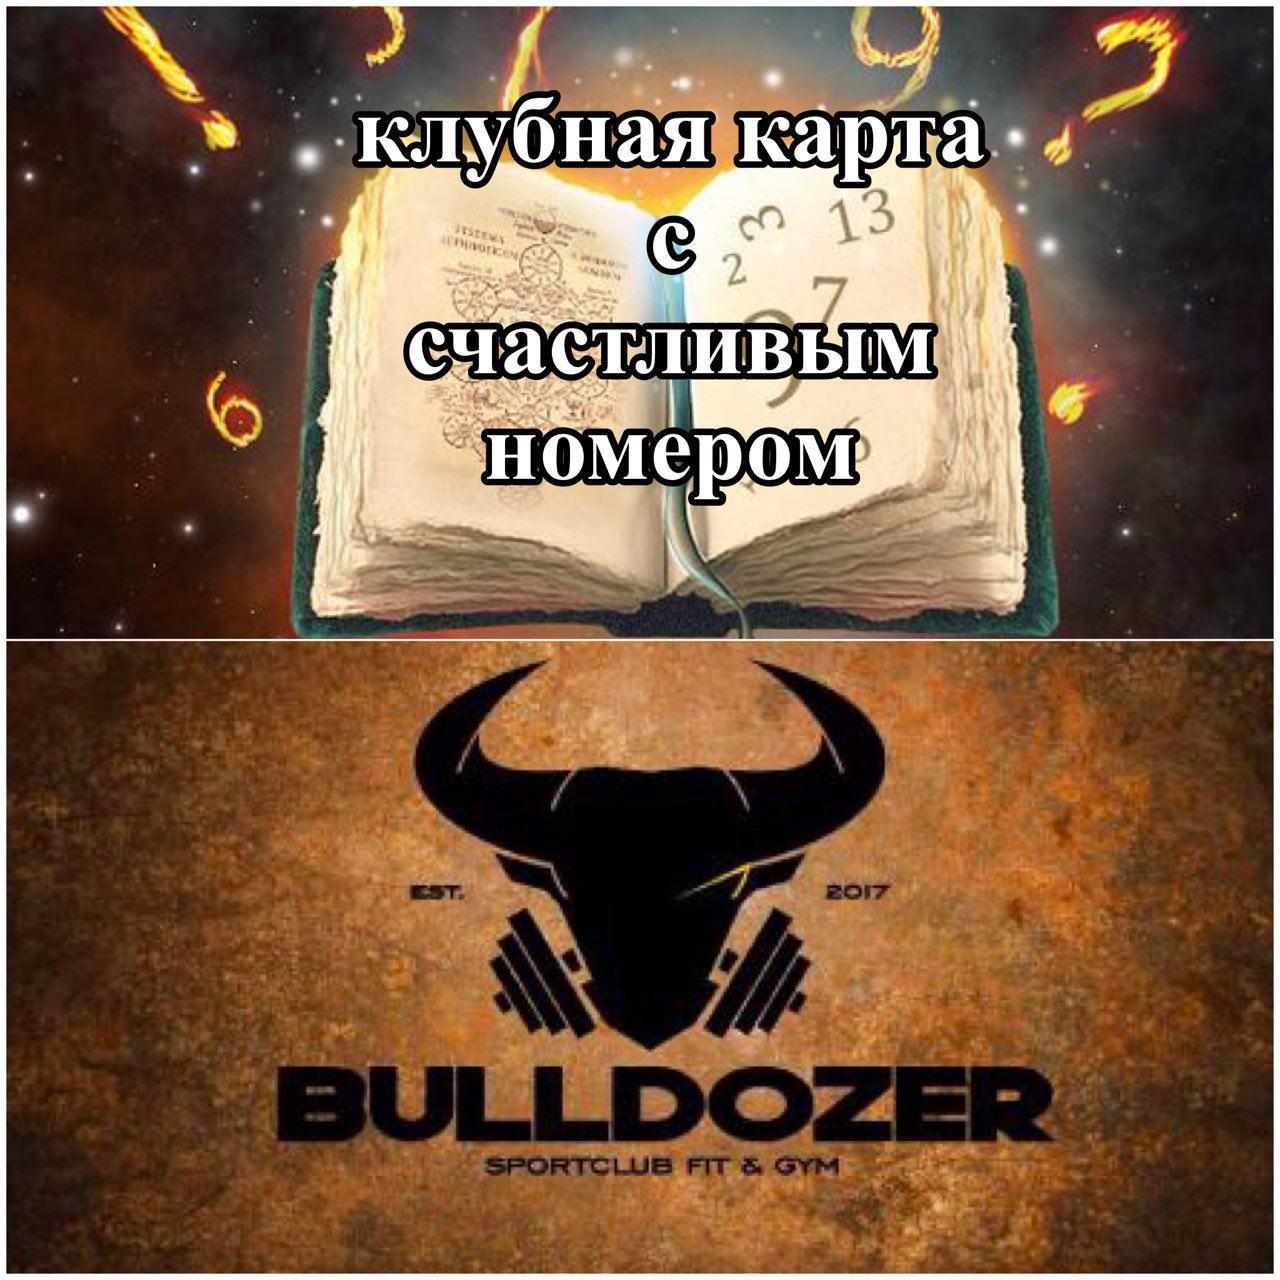 BULLDOZER спортивный клуб